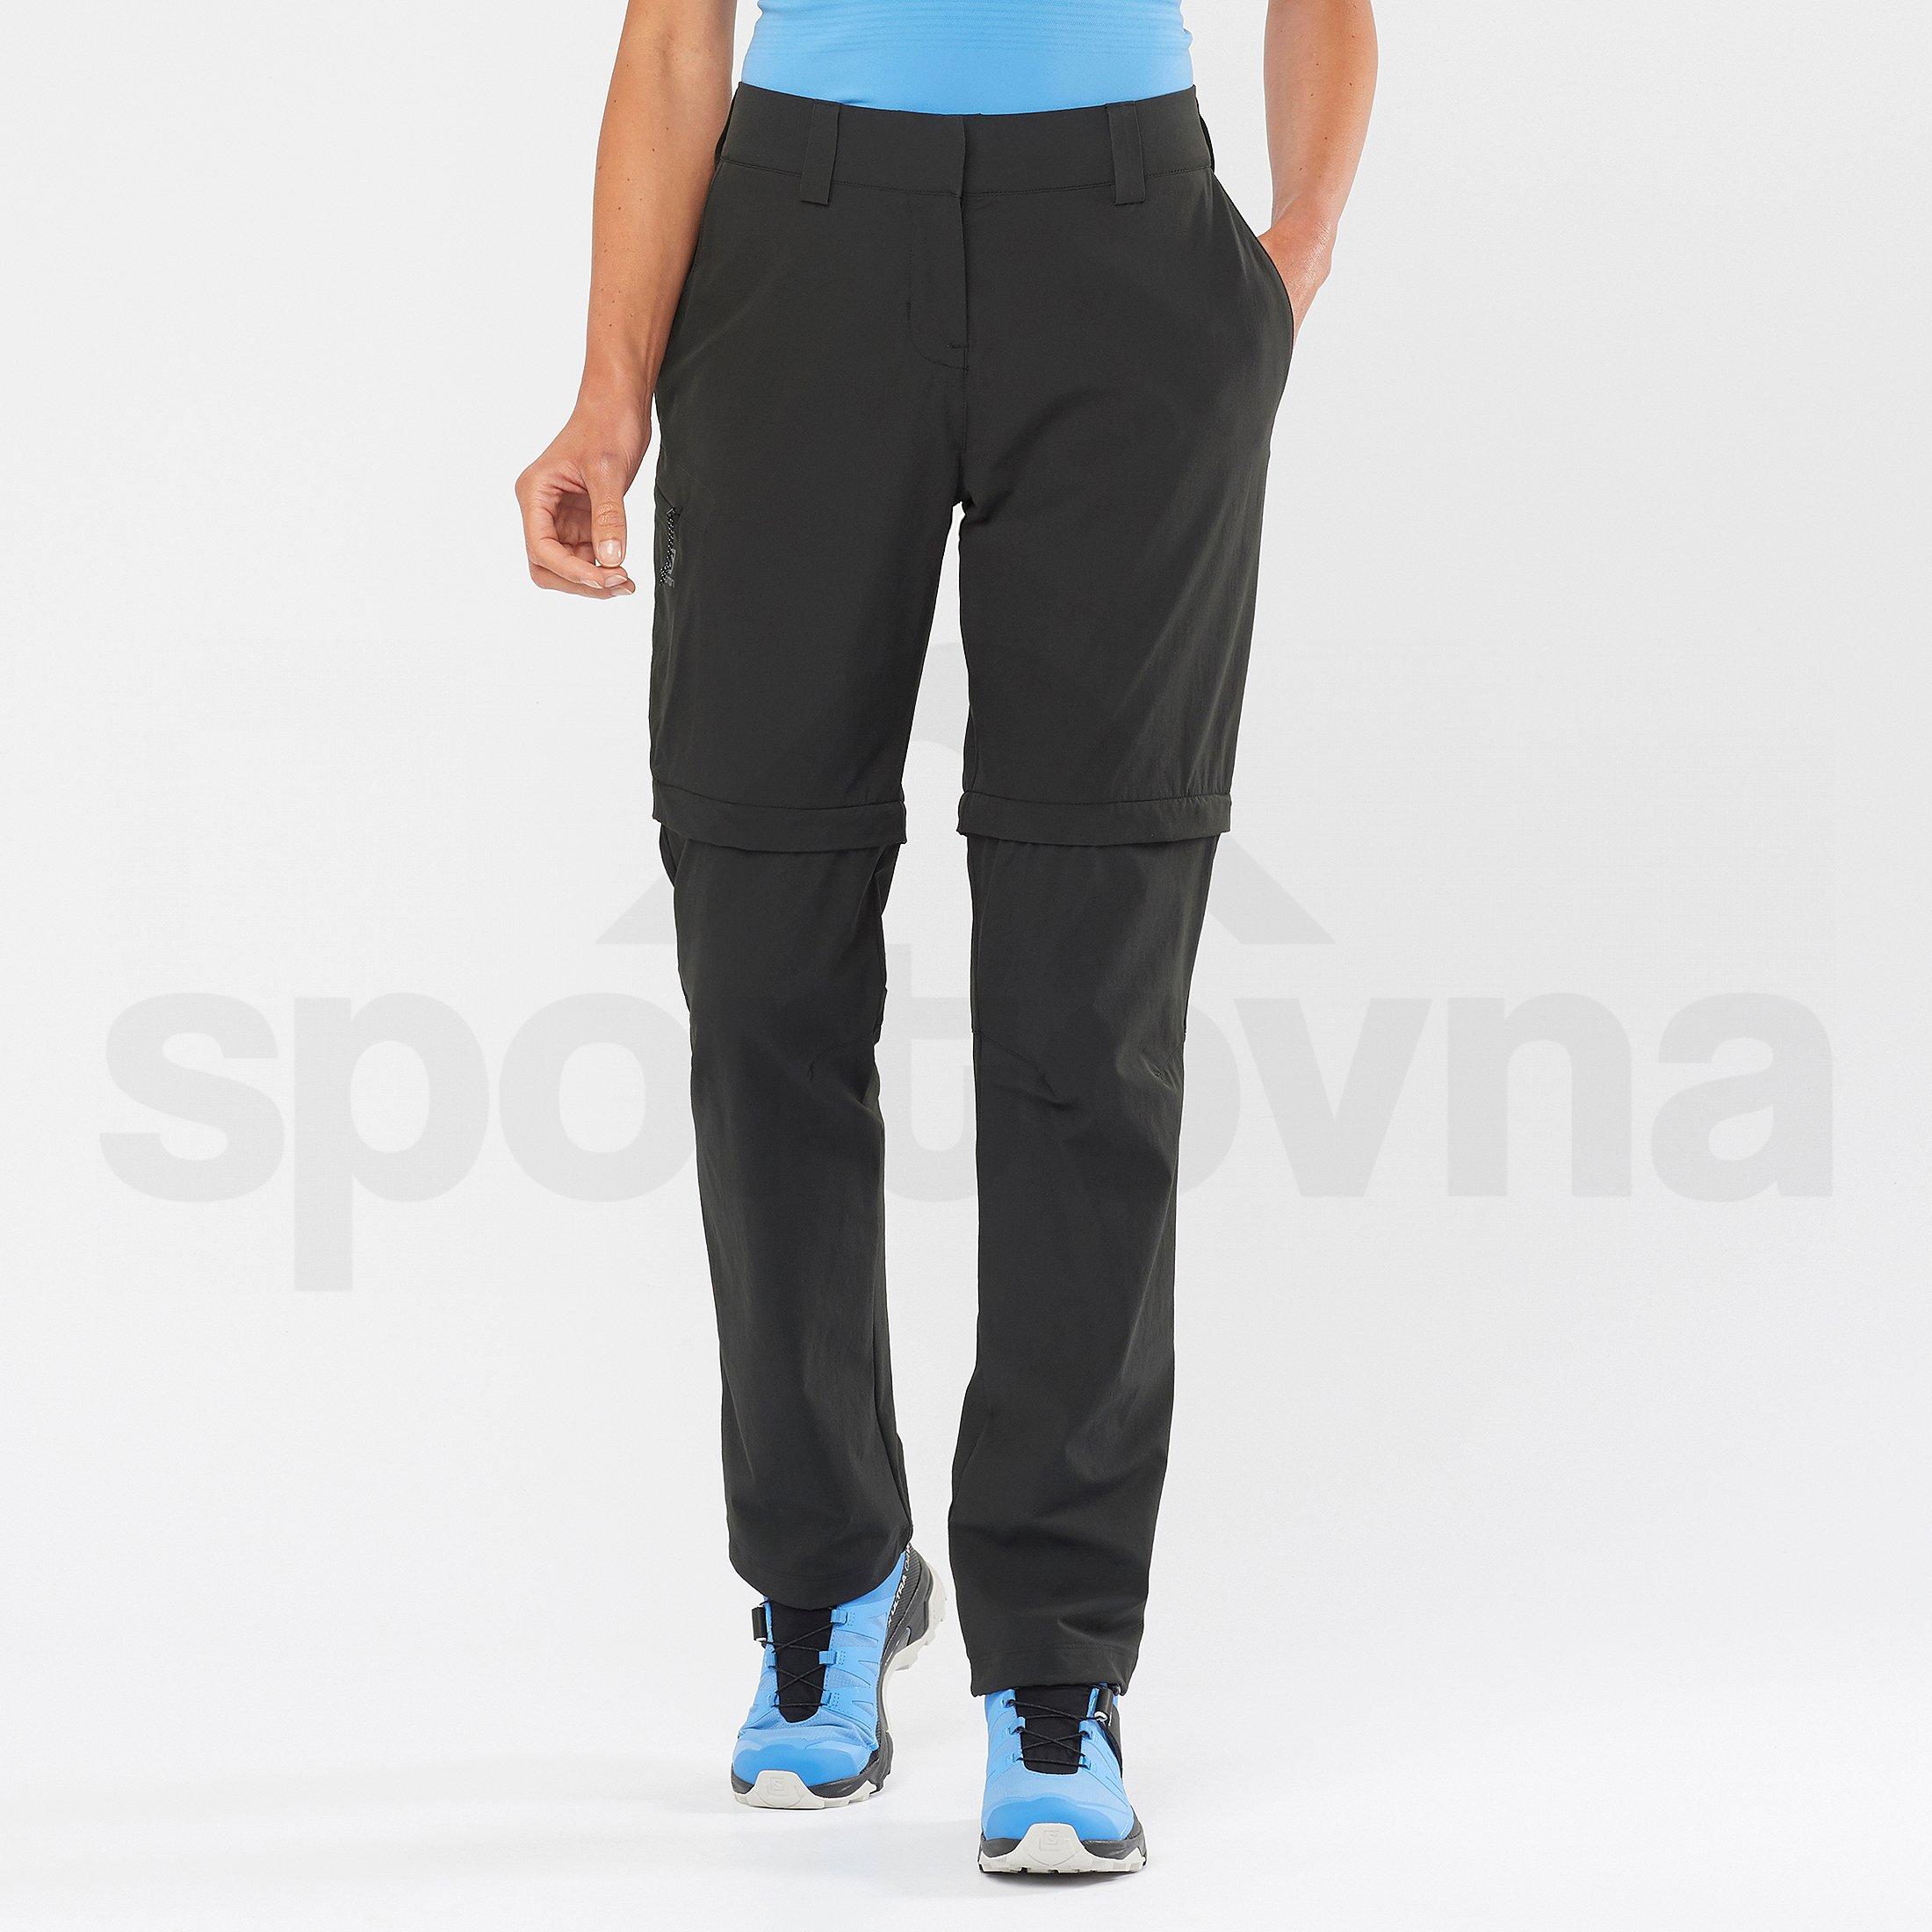 Kalhoty Salomon Wayfarer Zip Off Pant W - černá